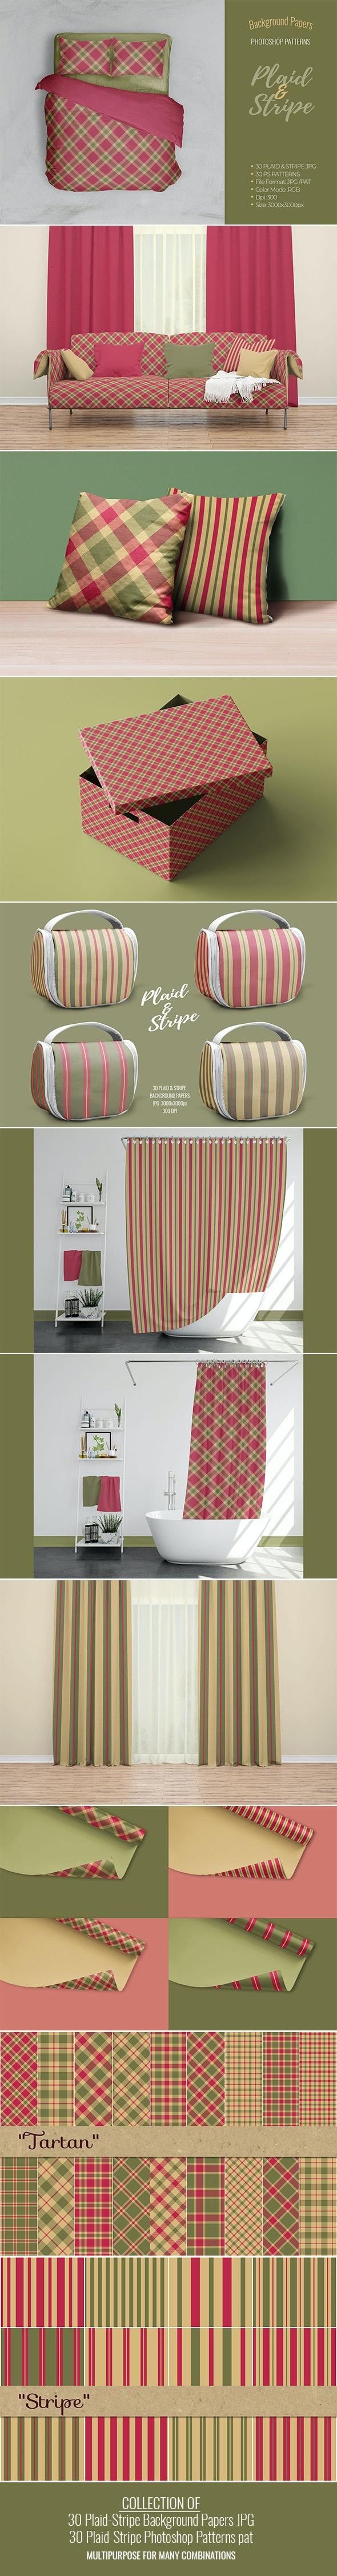 30 Plaid-Stripe PS Patterns pat.& 30 Plaid-Stripe Backgrounds JPG - Photoshop Add-ons